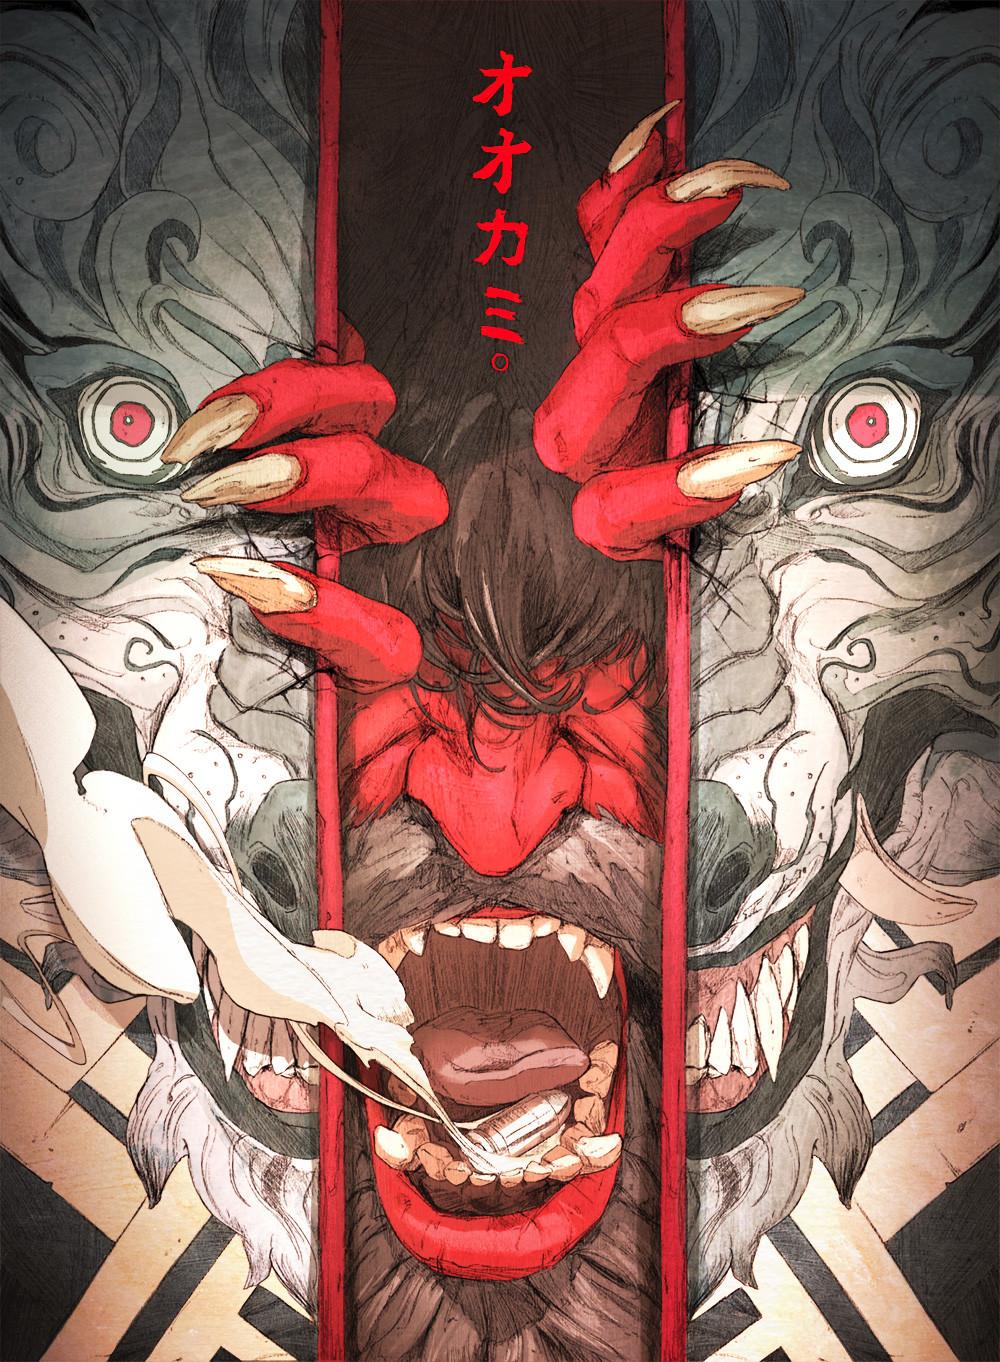 General 1000x1362 Chun Lo artwork digital demon red eyes